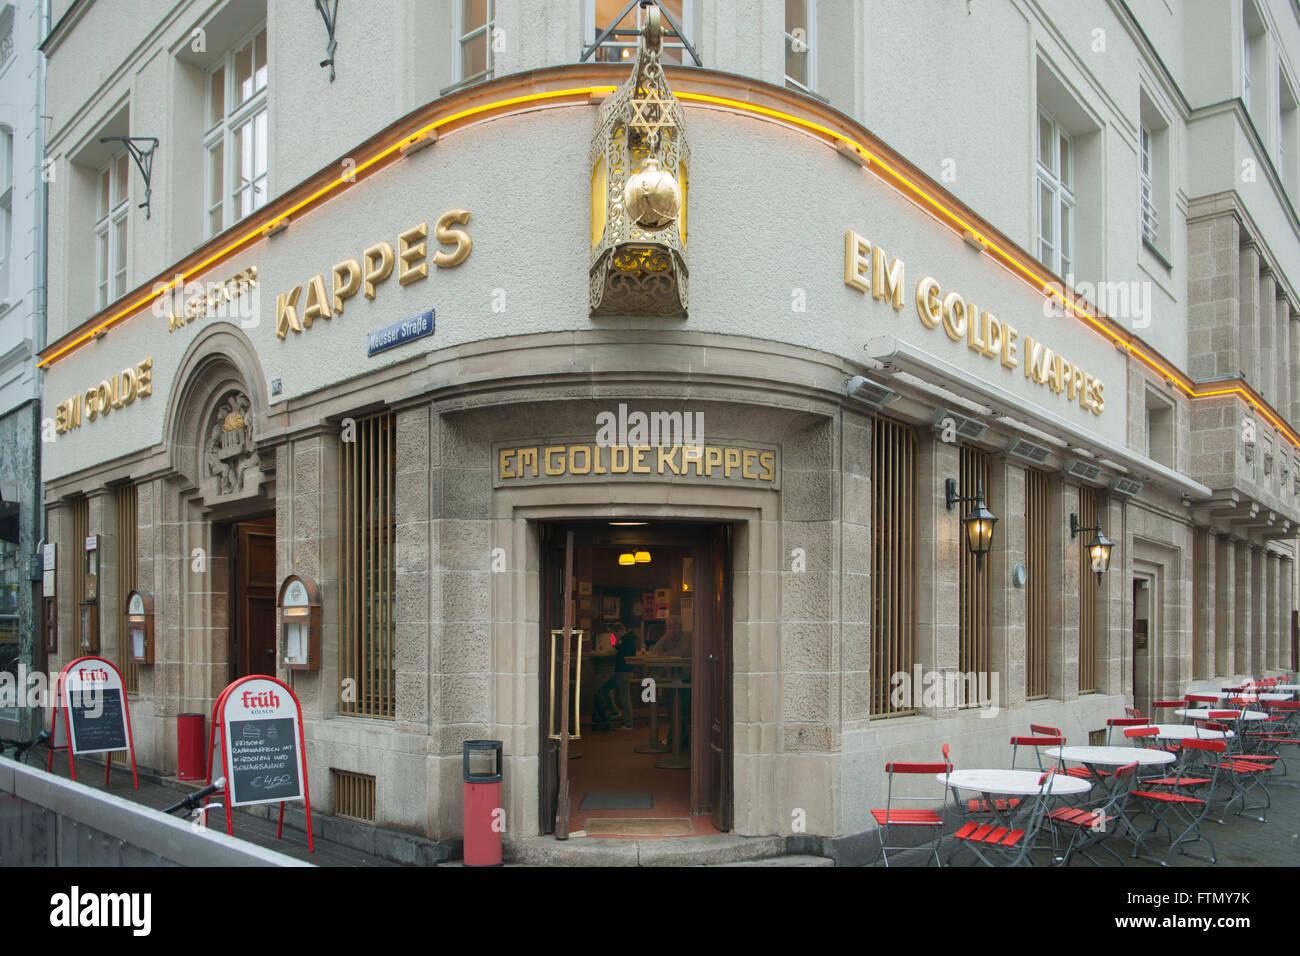 Köln, Nippes, Neusser Strasse 295, Em golde Kappes - Stock Image